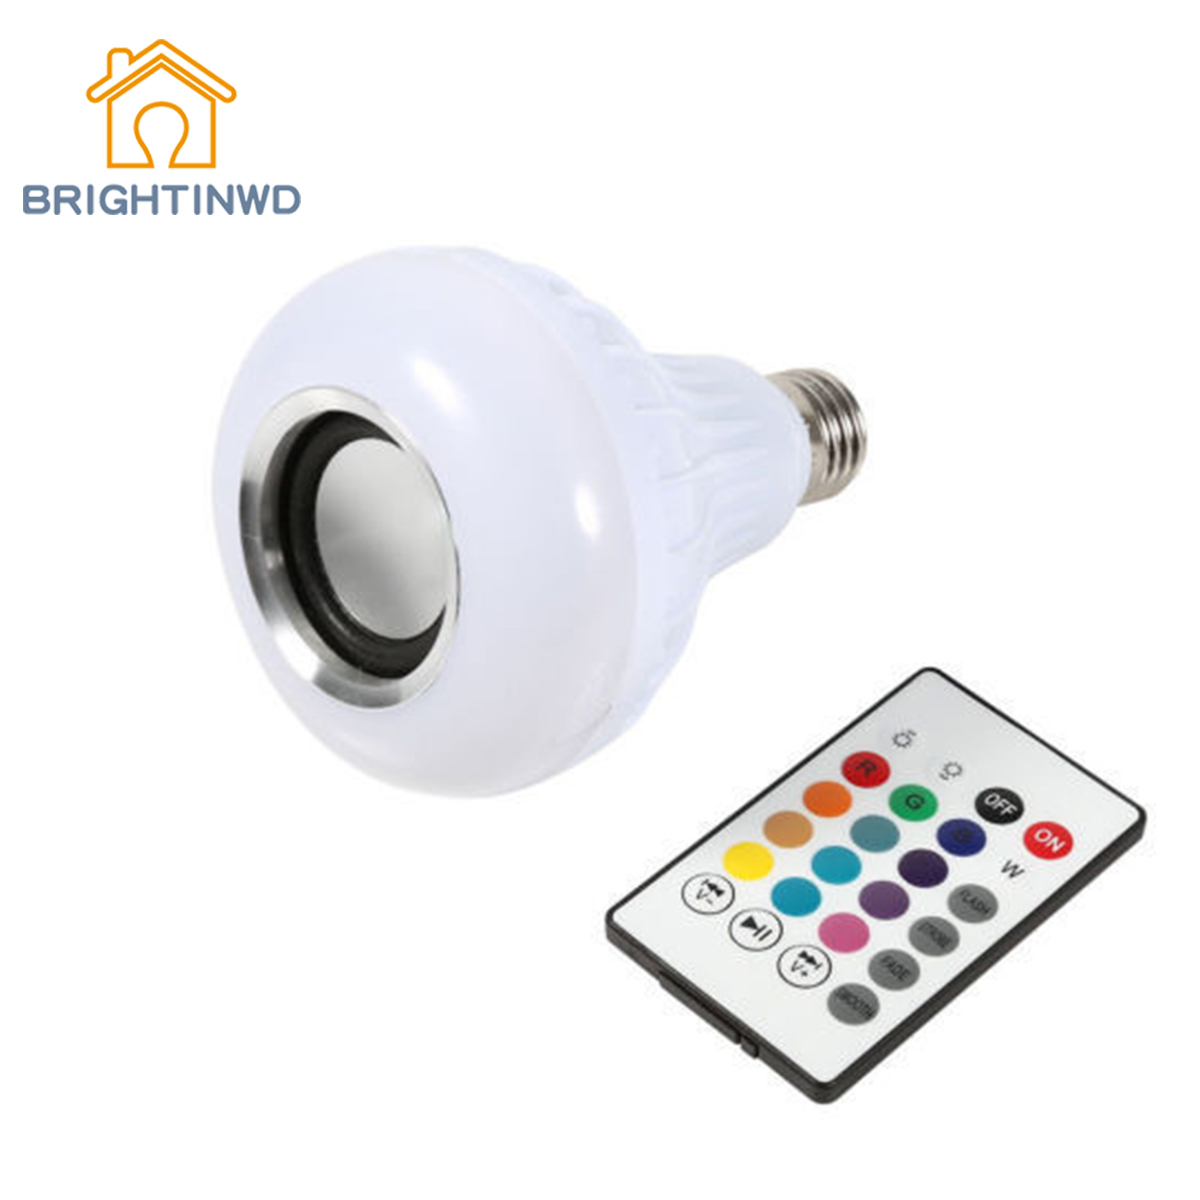 LED Wireless Bluetooth Bulb Light Speaker 12W RGB Smart Music Play Lamp+ RemoteX wireless bluetooth speaker led audio portable mini subwoofer